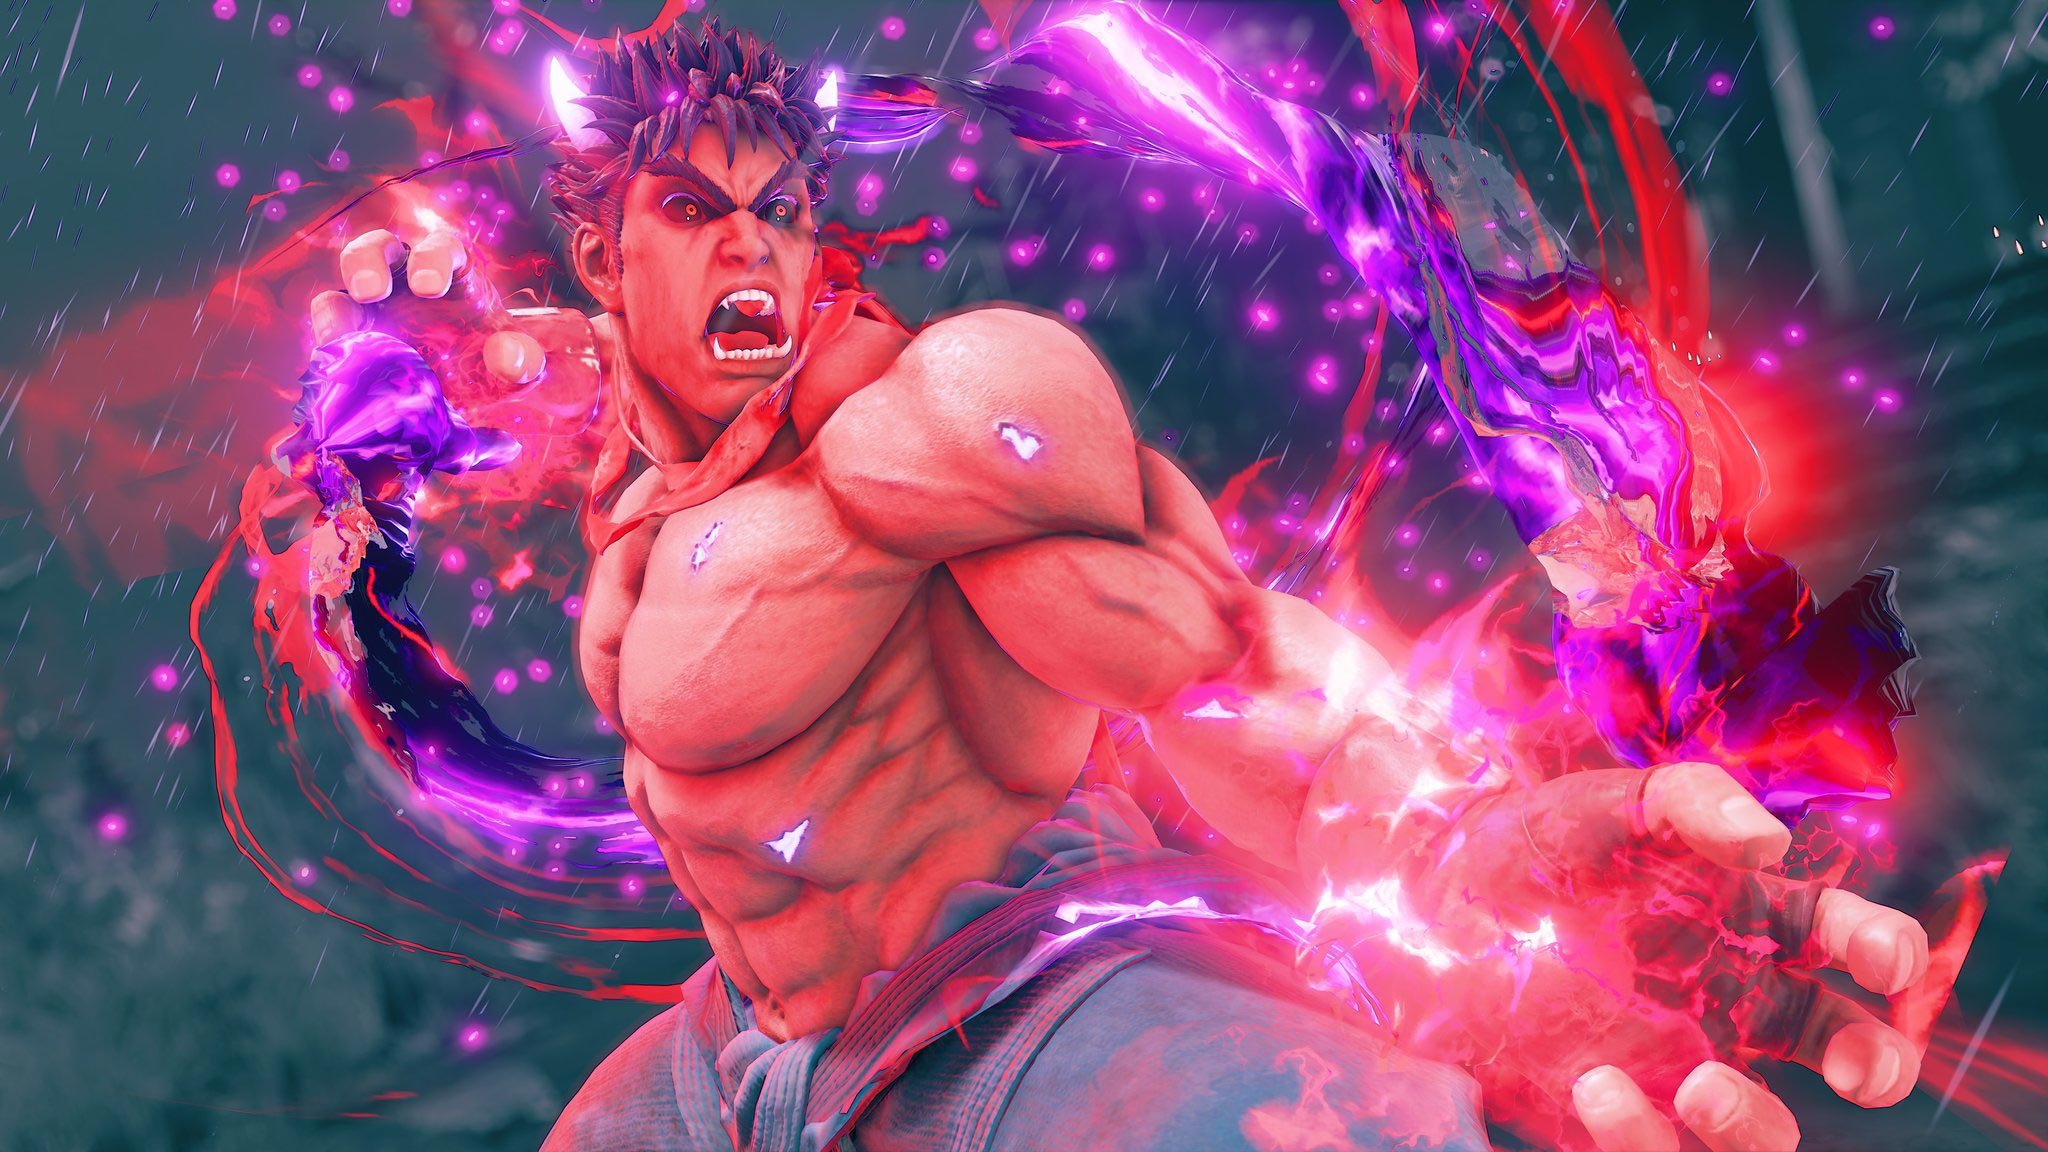 Eden's Street Fighter stills 8 out of 12 image gallery